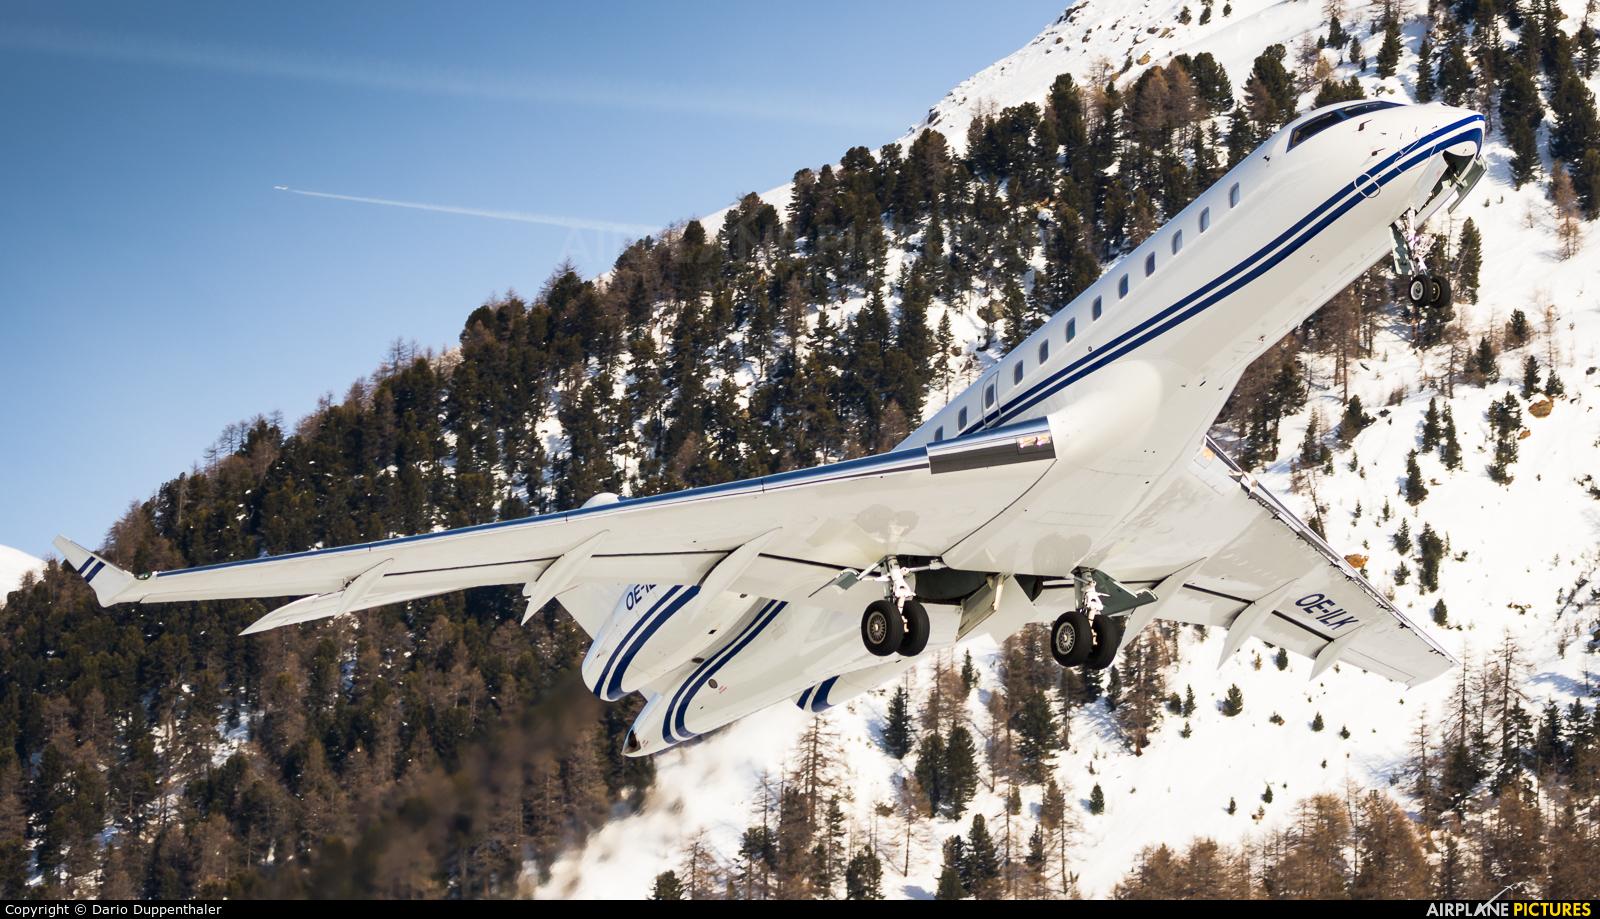 LaudaMotion OE-ILK aircraft at Samedan - Engadin